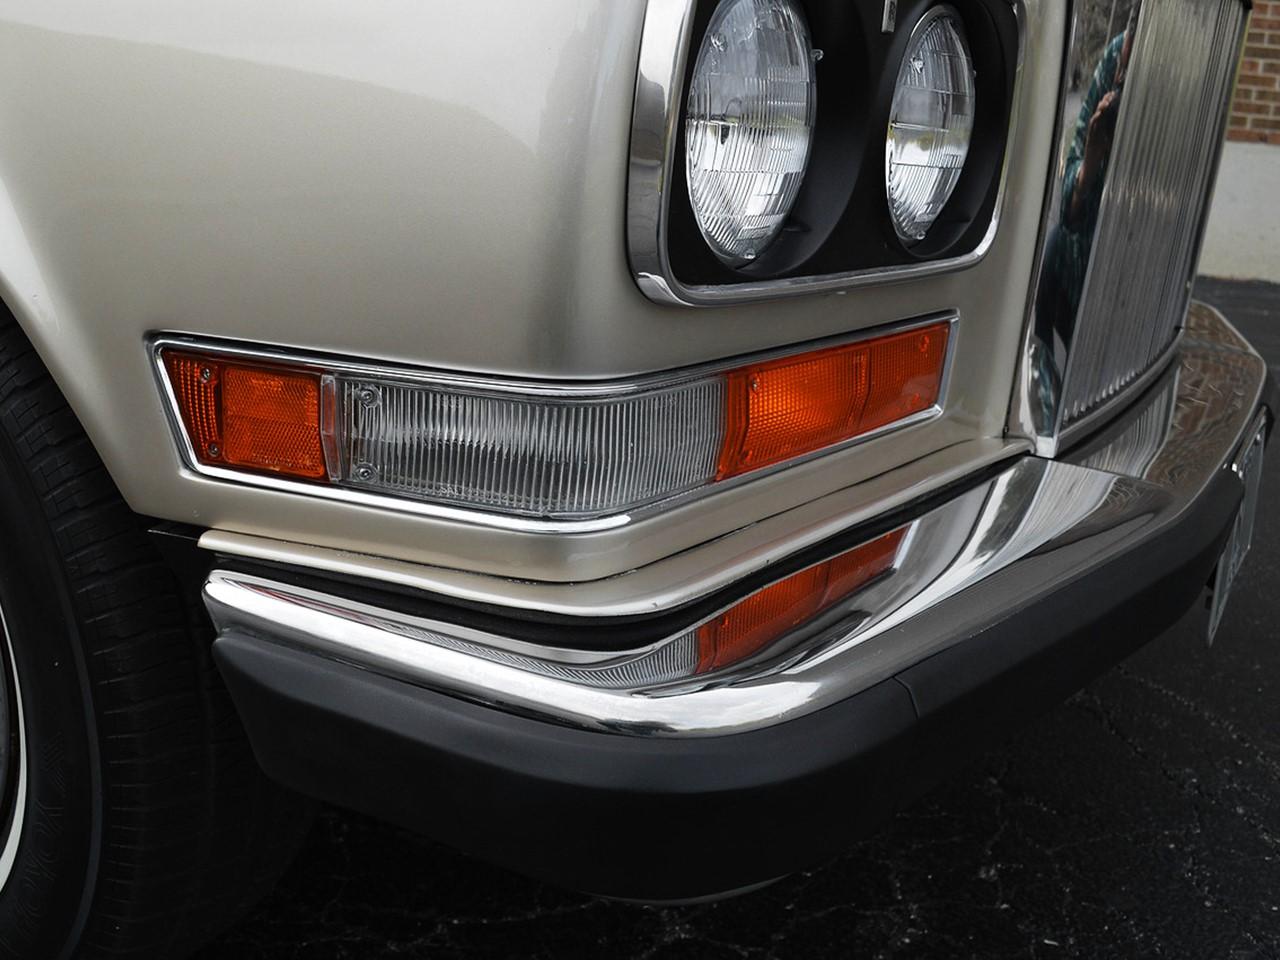 1986 Camargue 35